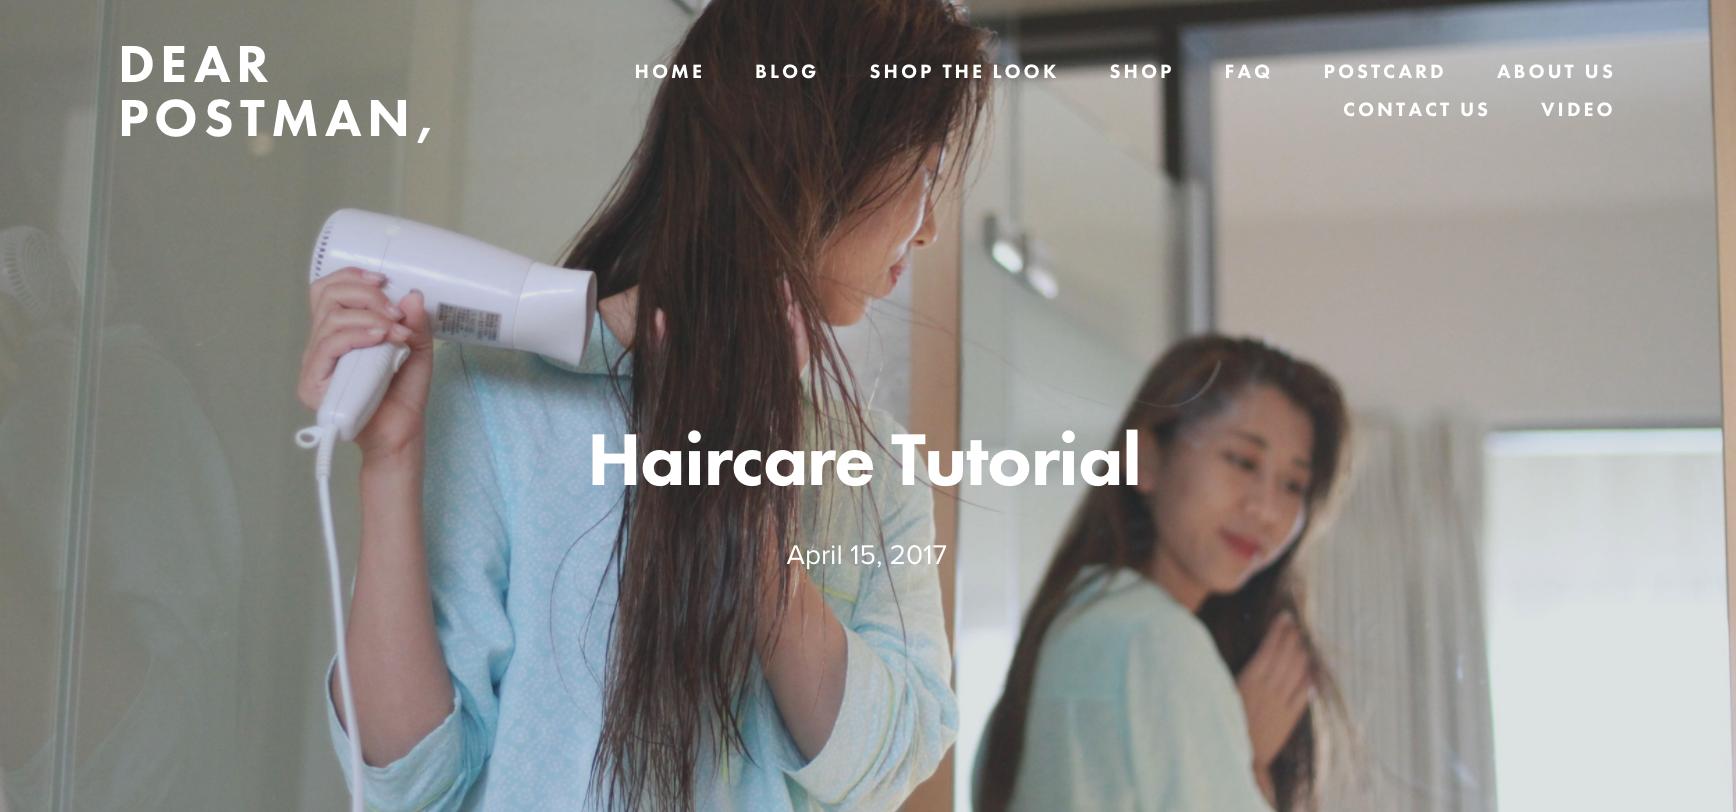 Haircare Tutorial